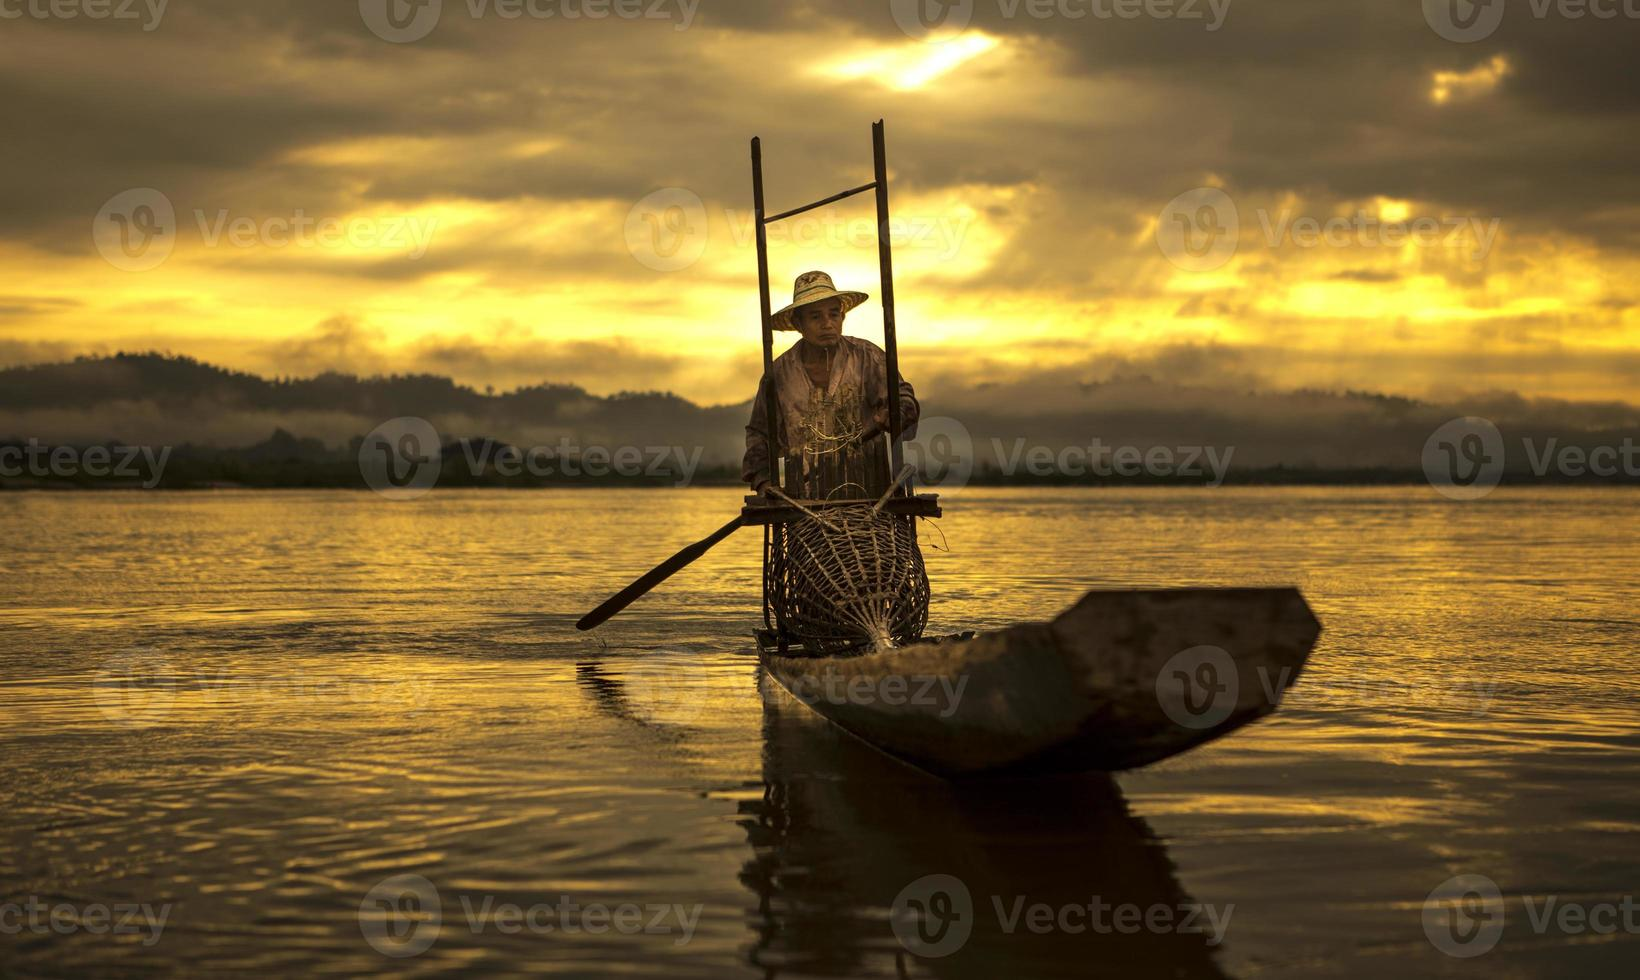 pescador no barco captura de peixe foto